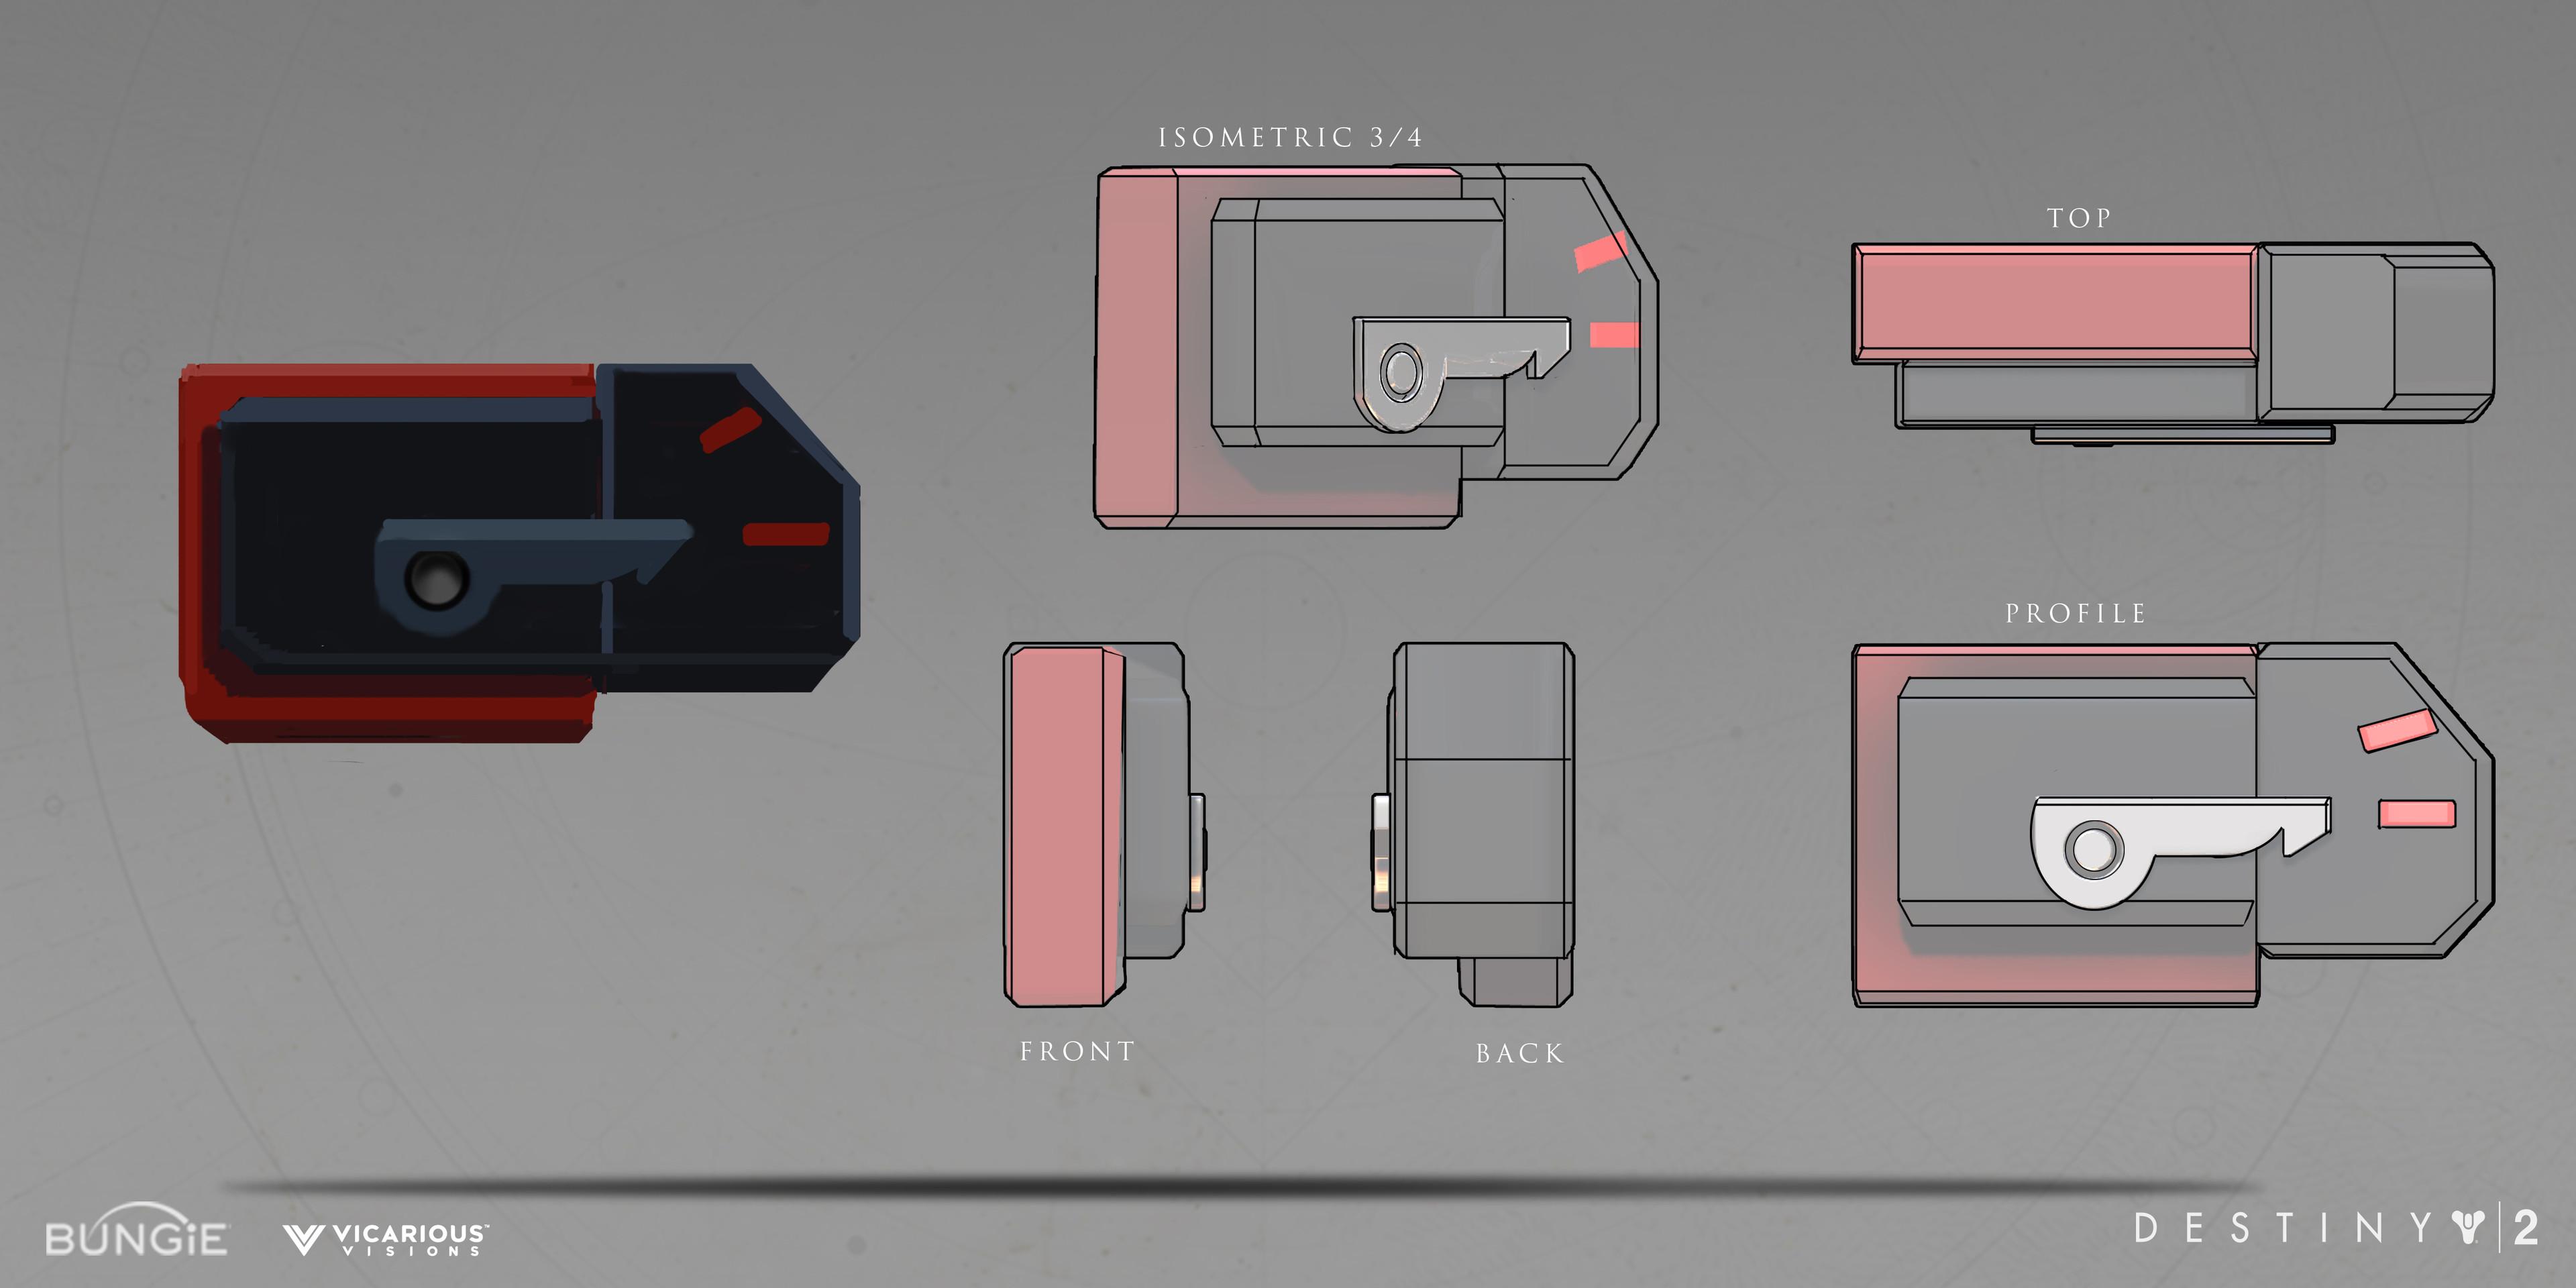 Black Armory Telemetry Box accessory B: